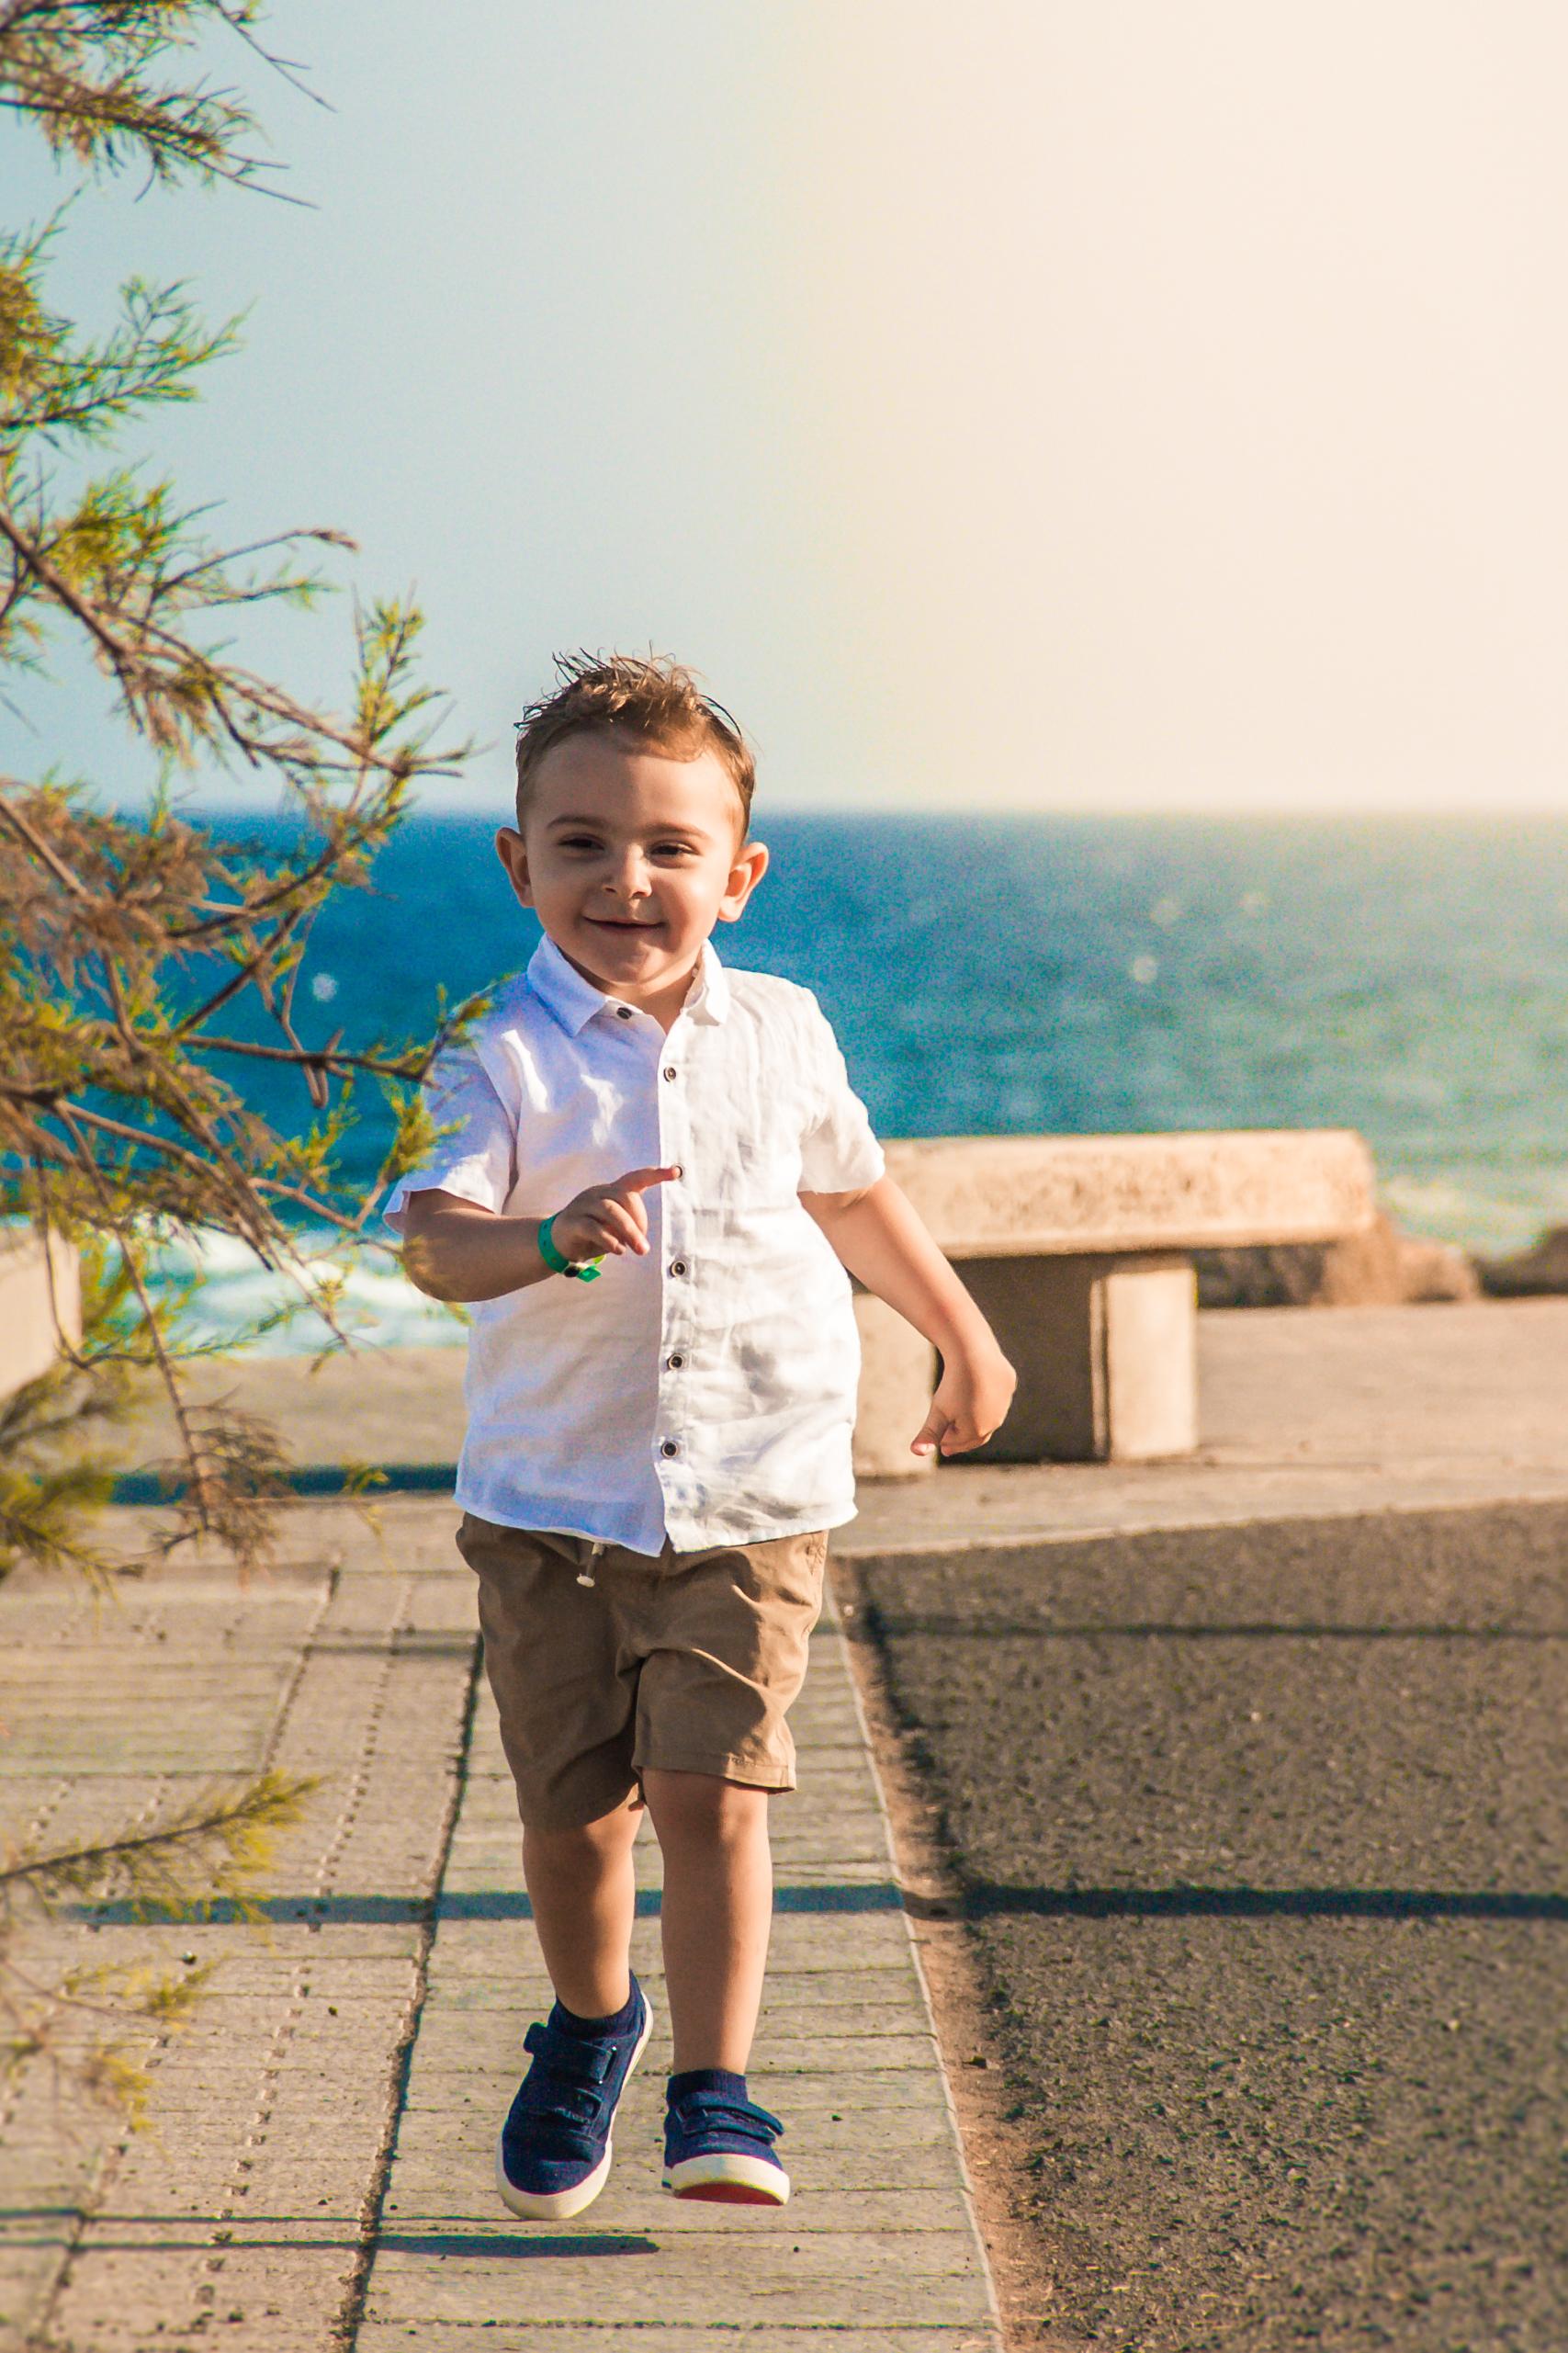 Family photographer in Fuerteventura & Lanzarote. Fotografo de familias en Fuerteventura & Lanzarote.